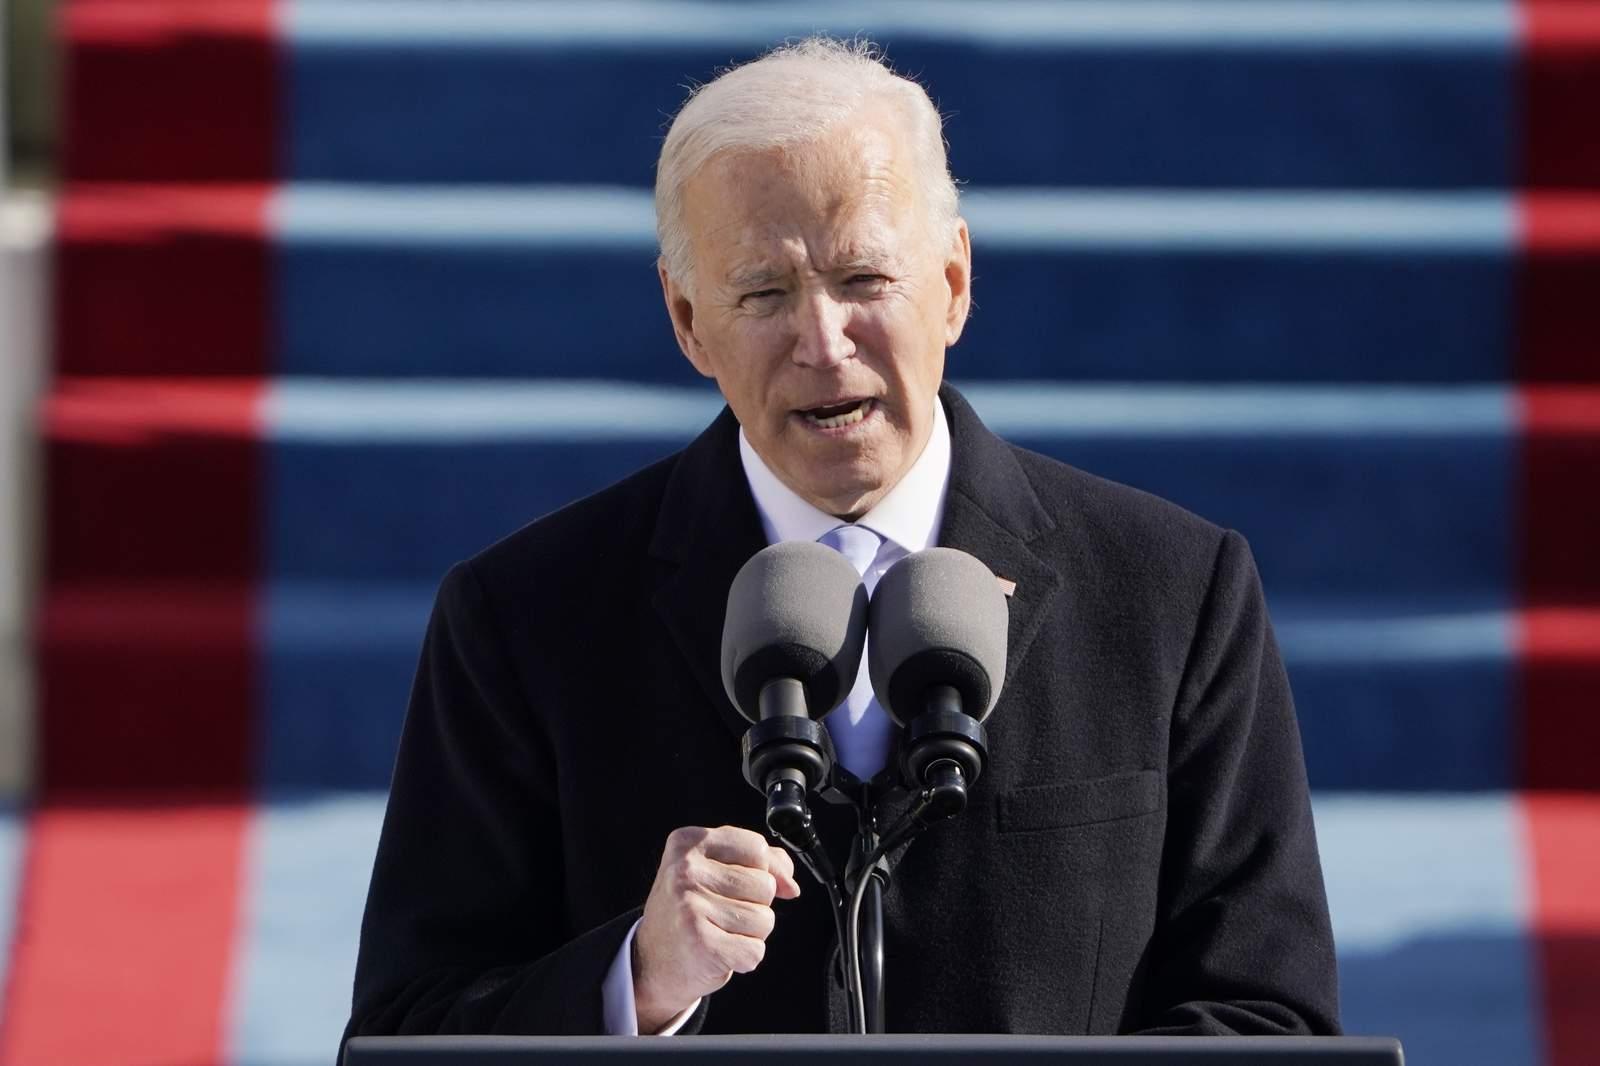 Joe Biden speaking to crowd